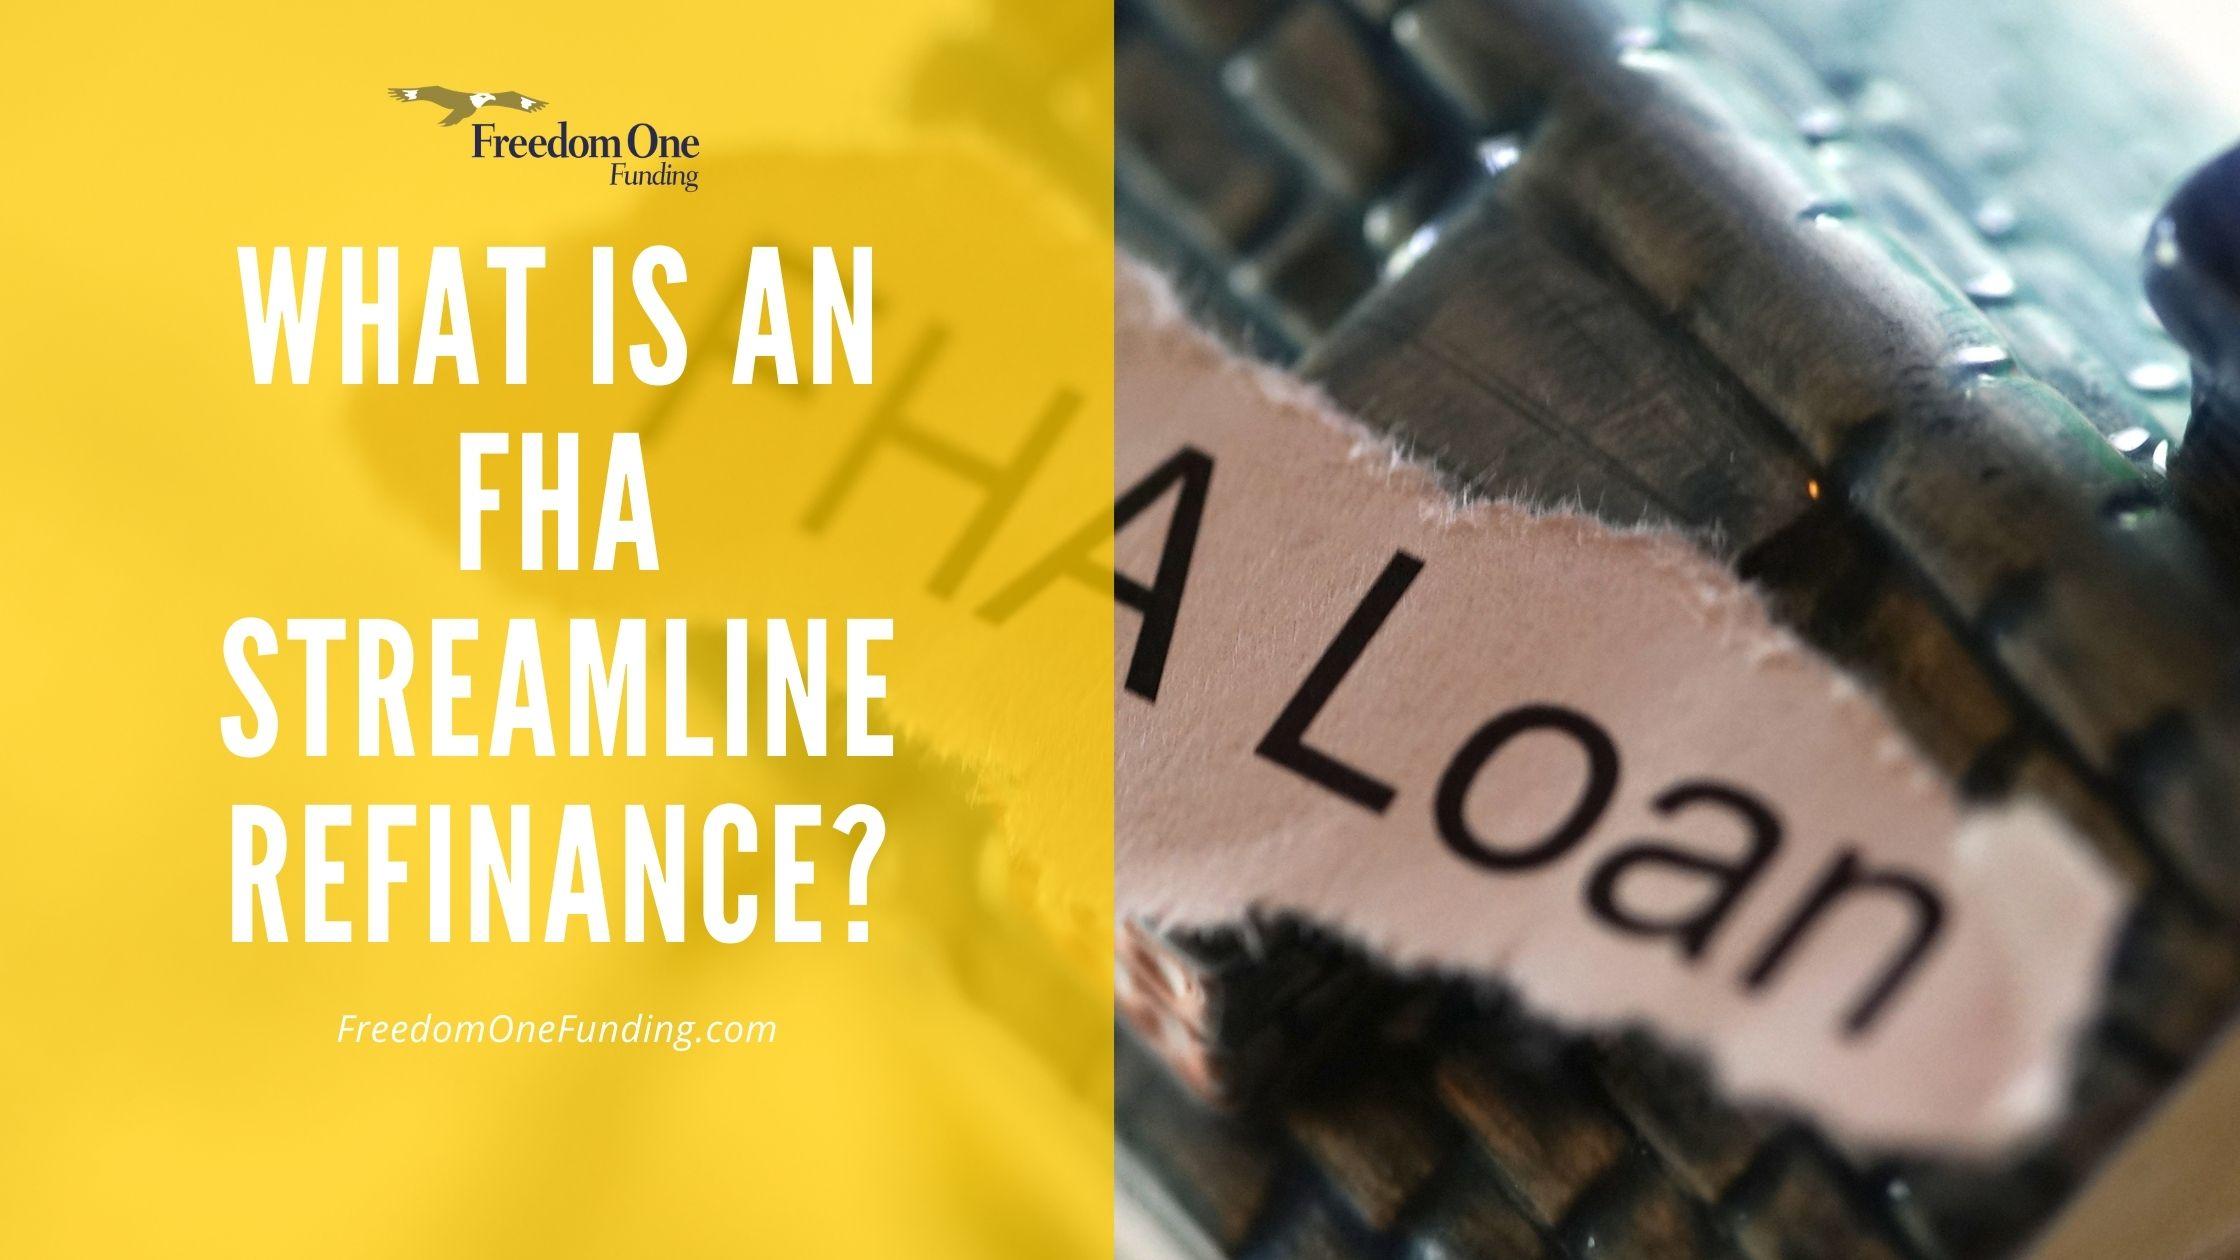 What is an FHA Streamline Refinance?